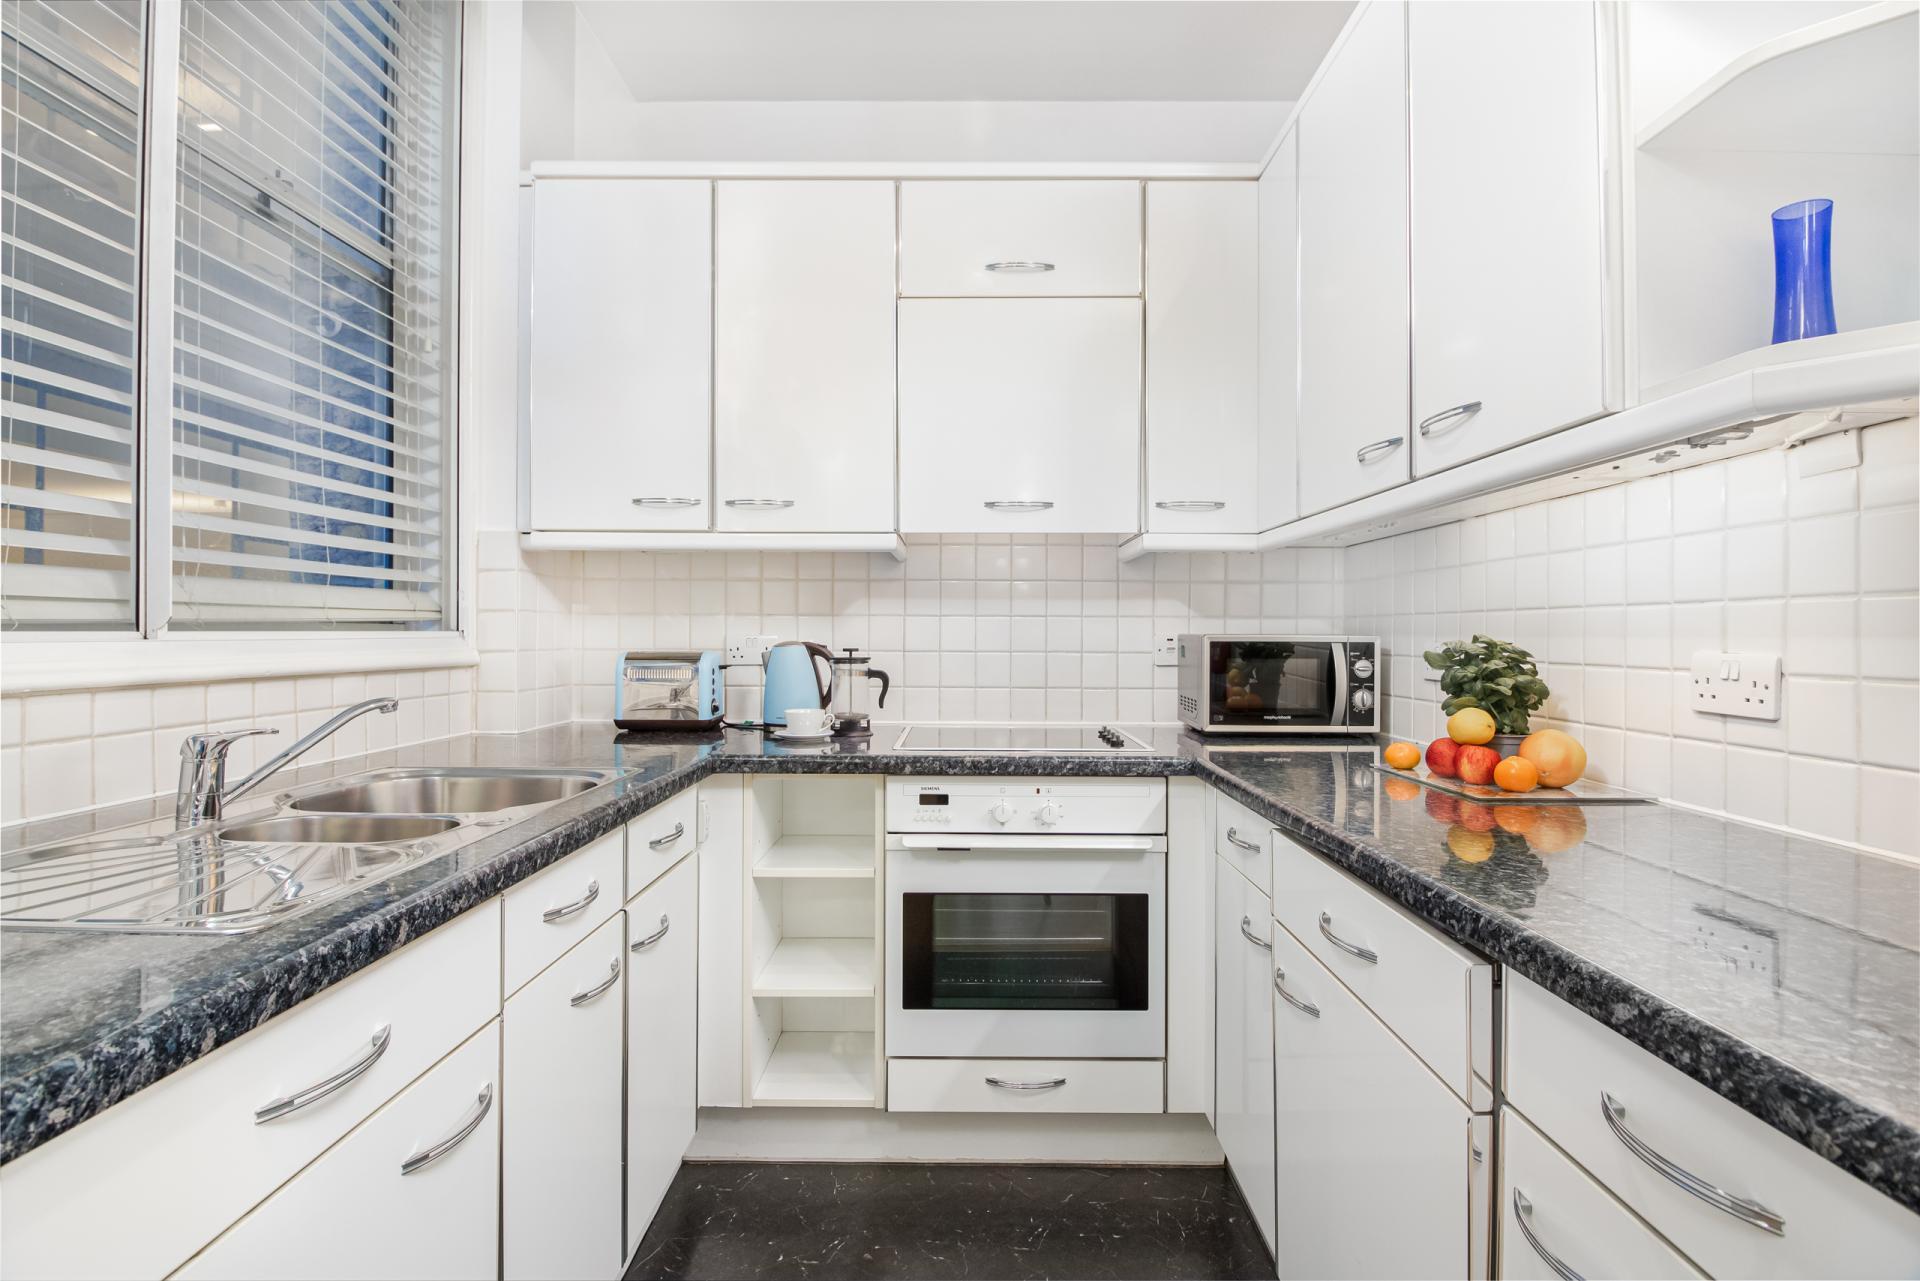 Sleek kitchen at Priory House Apartments, City, London